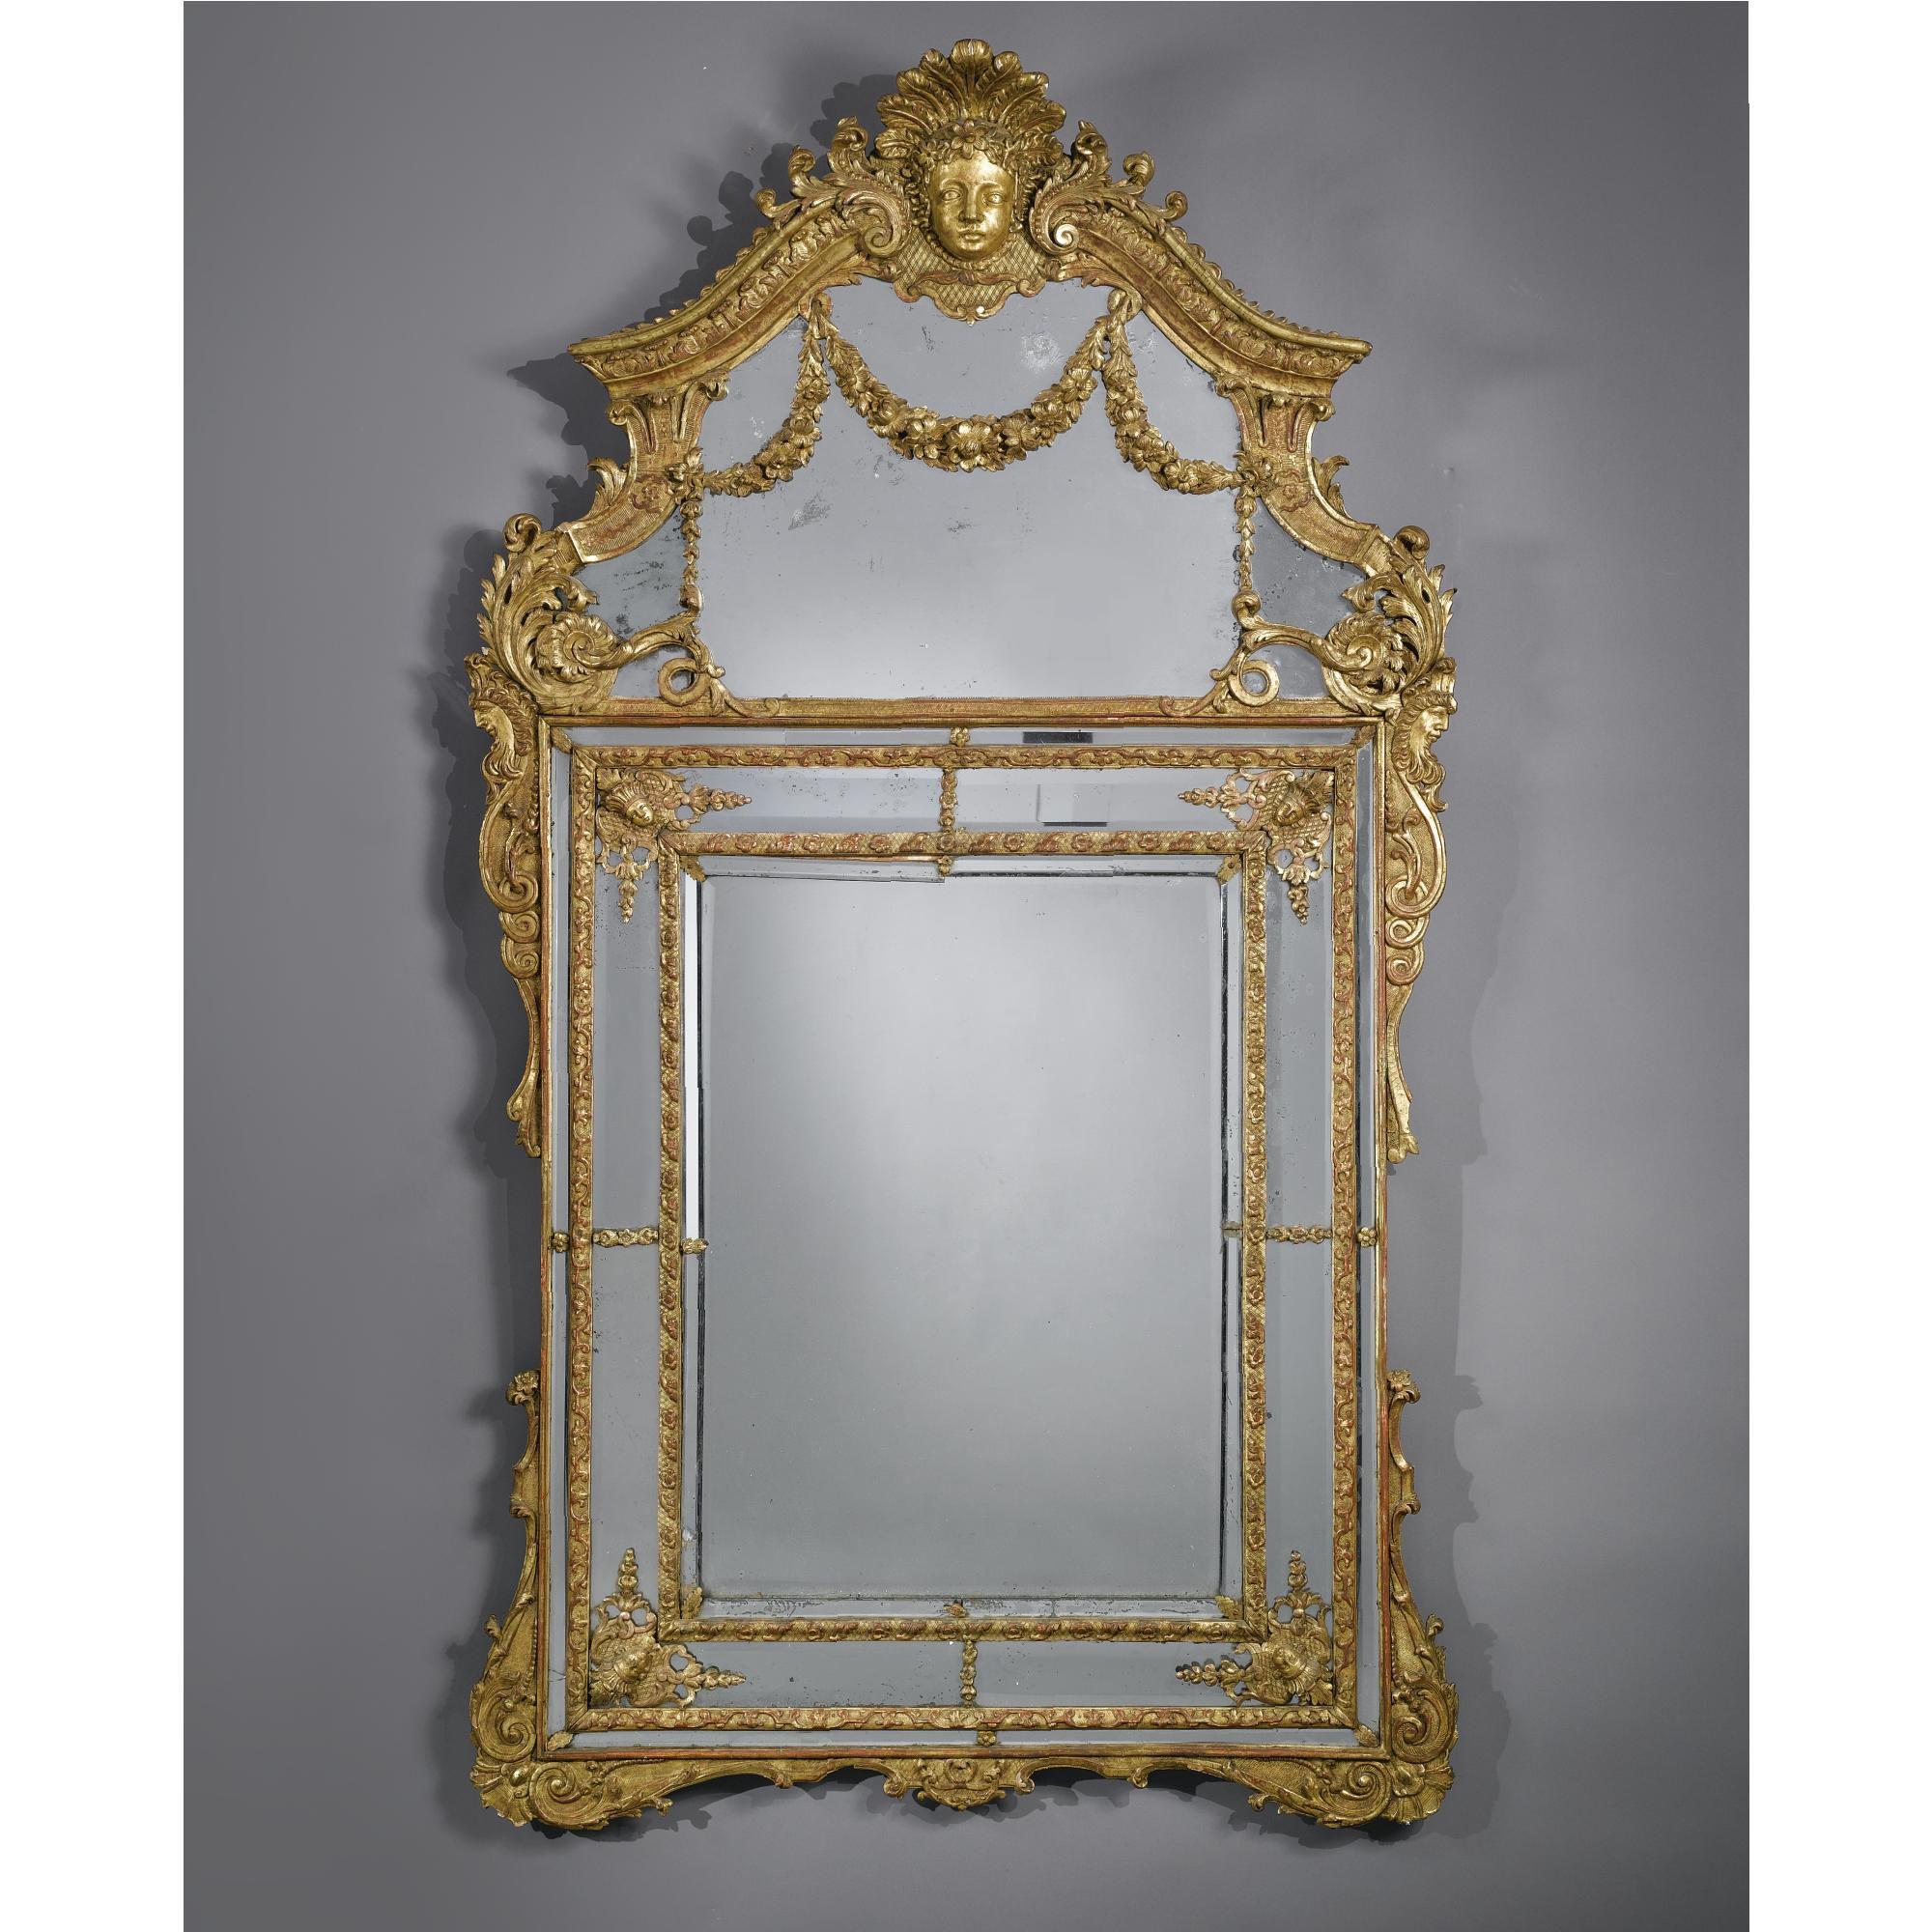 c1710 A fine Régence giltwood mirror circa 1710 Estimate